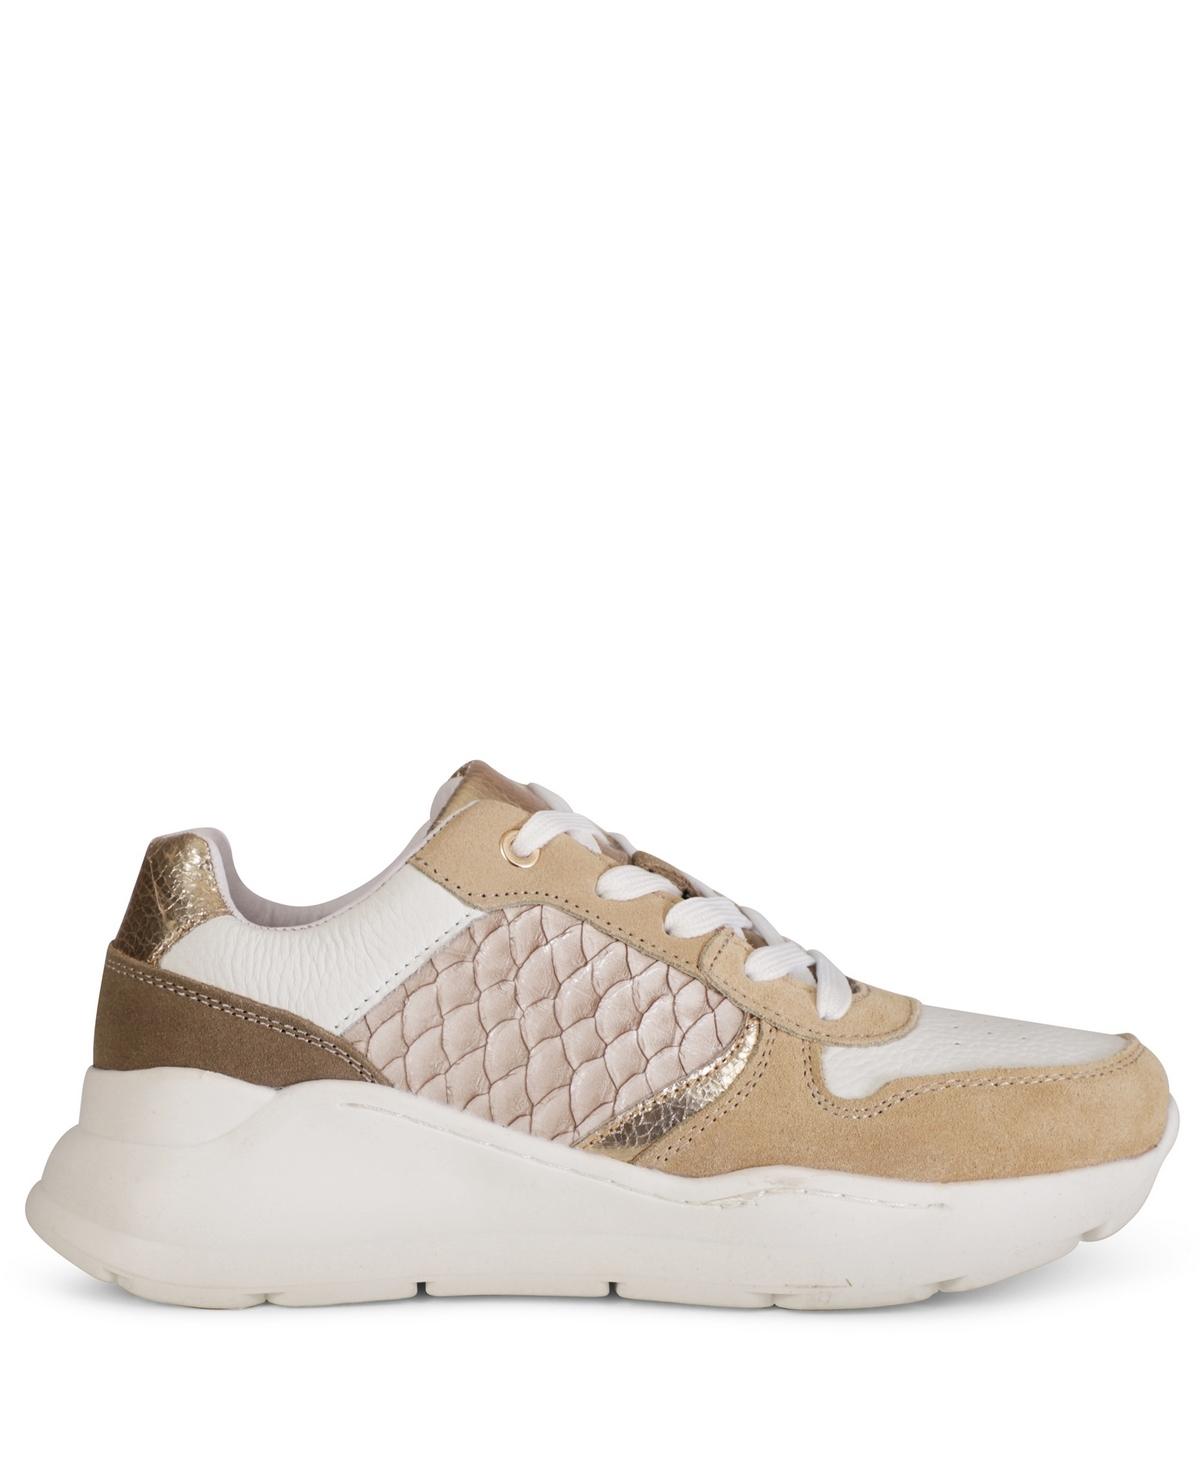 Shoecolate Sneaker Beige 8.10.06.031